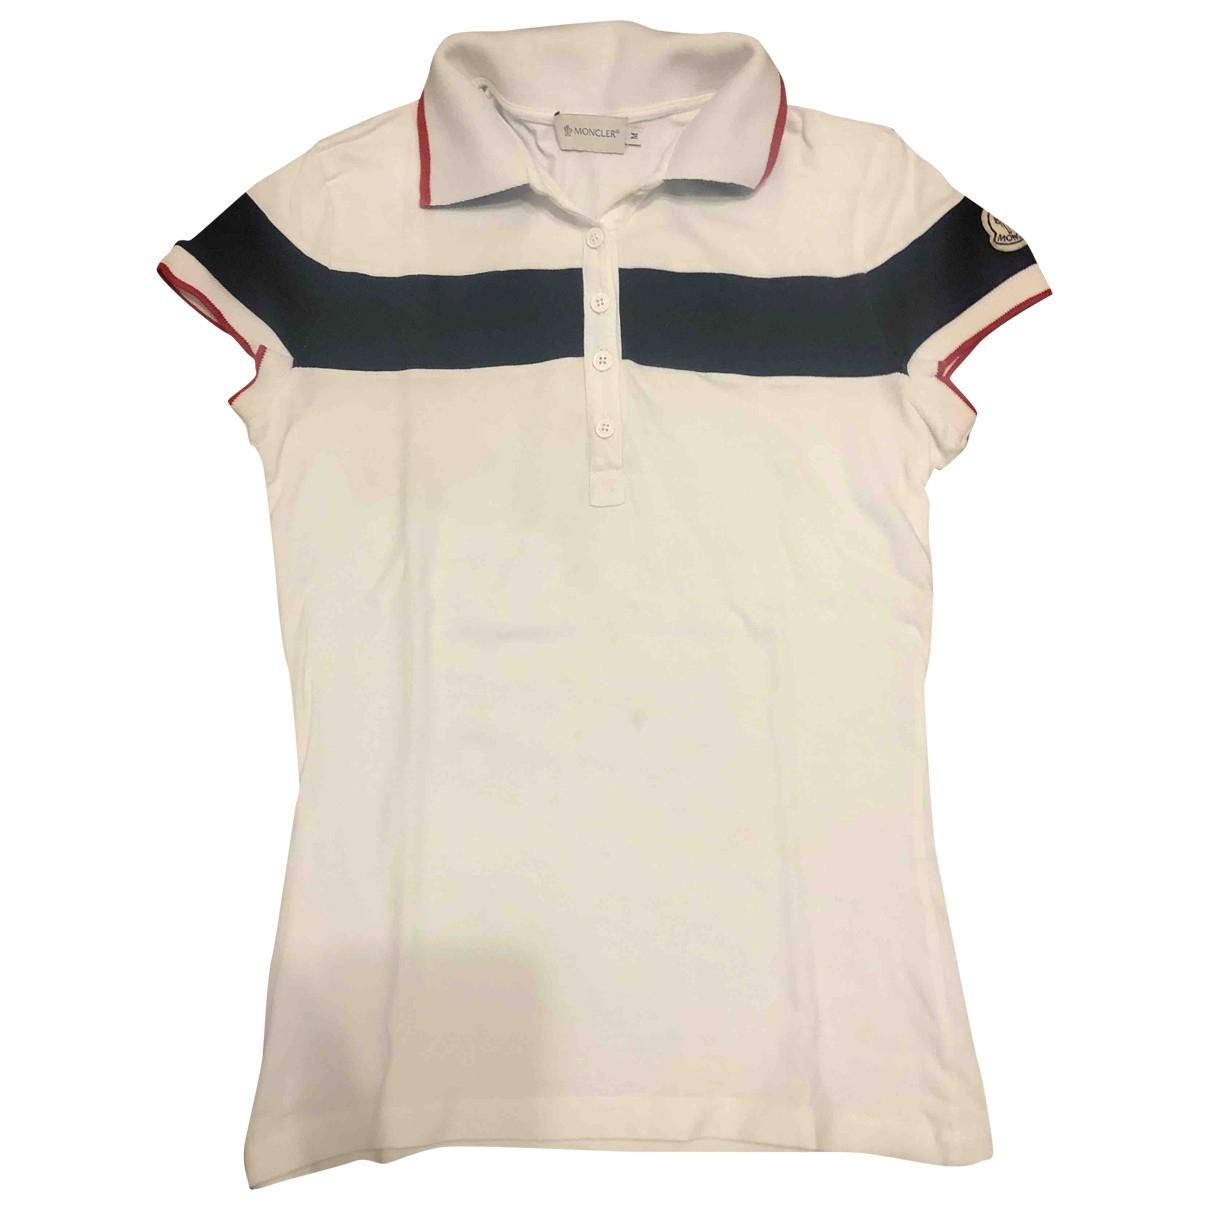 Moncler \N White Cotton  top for Women M International